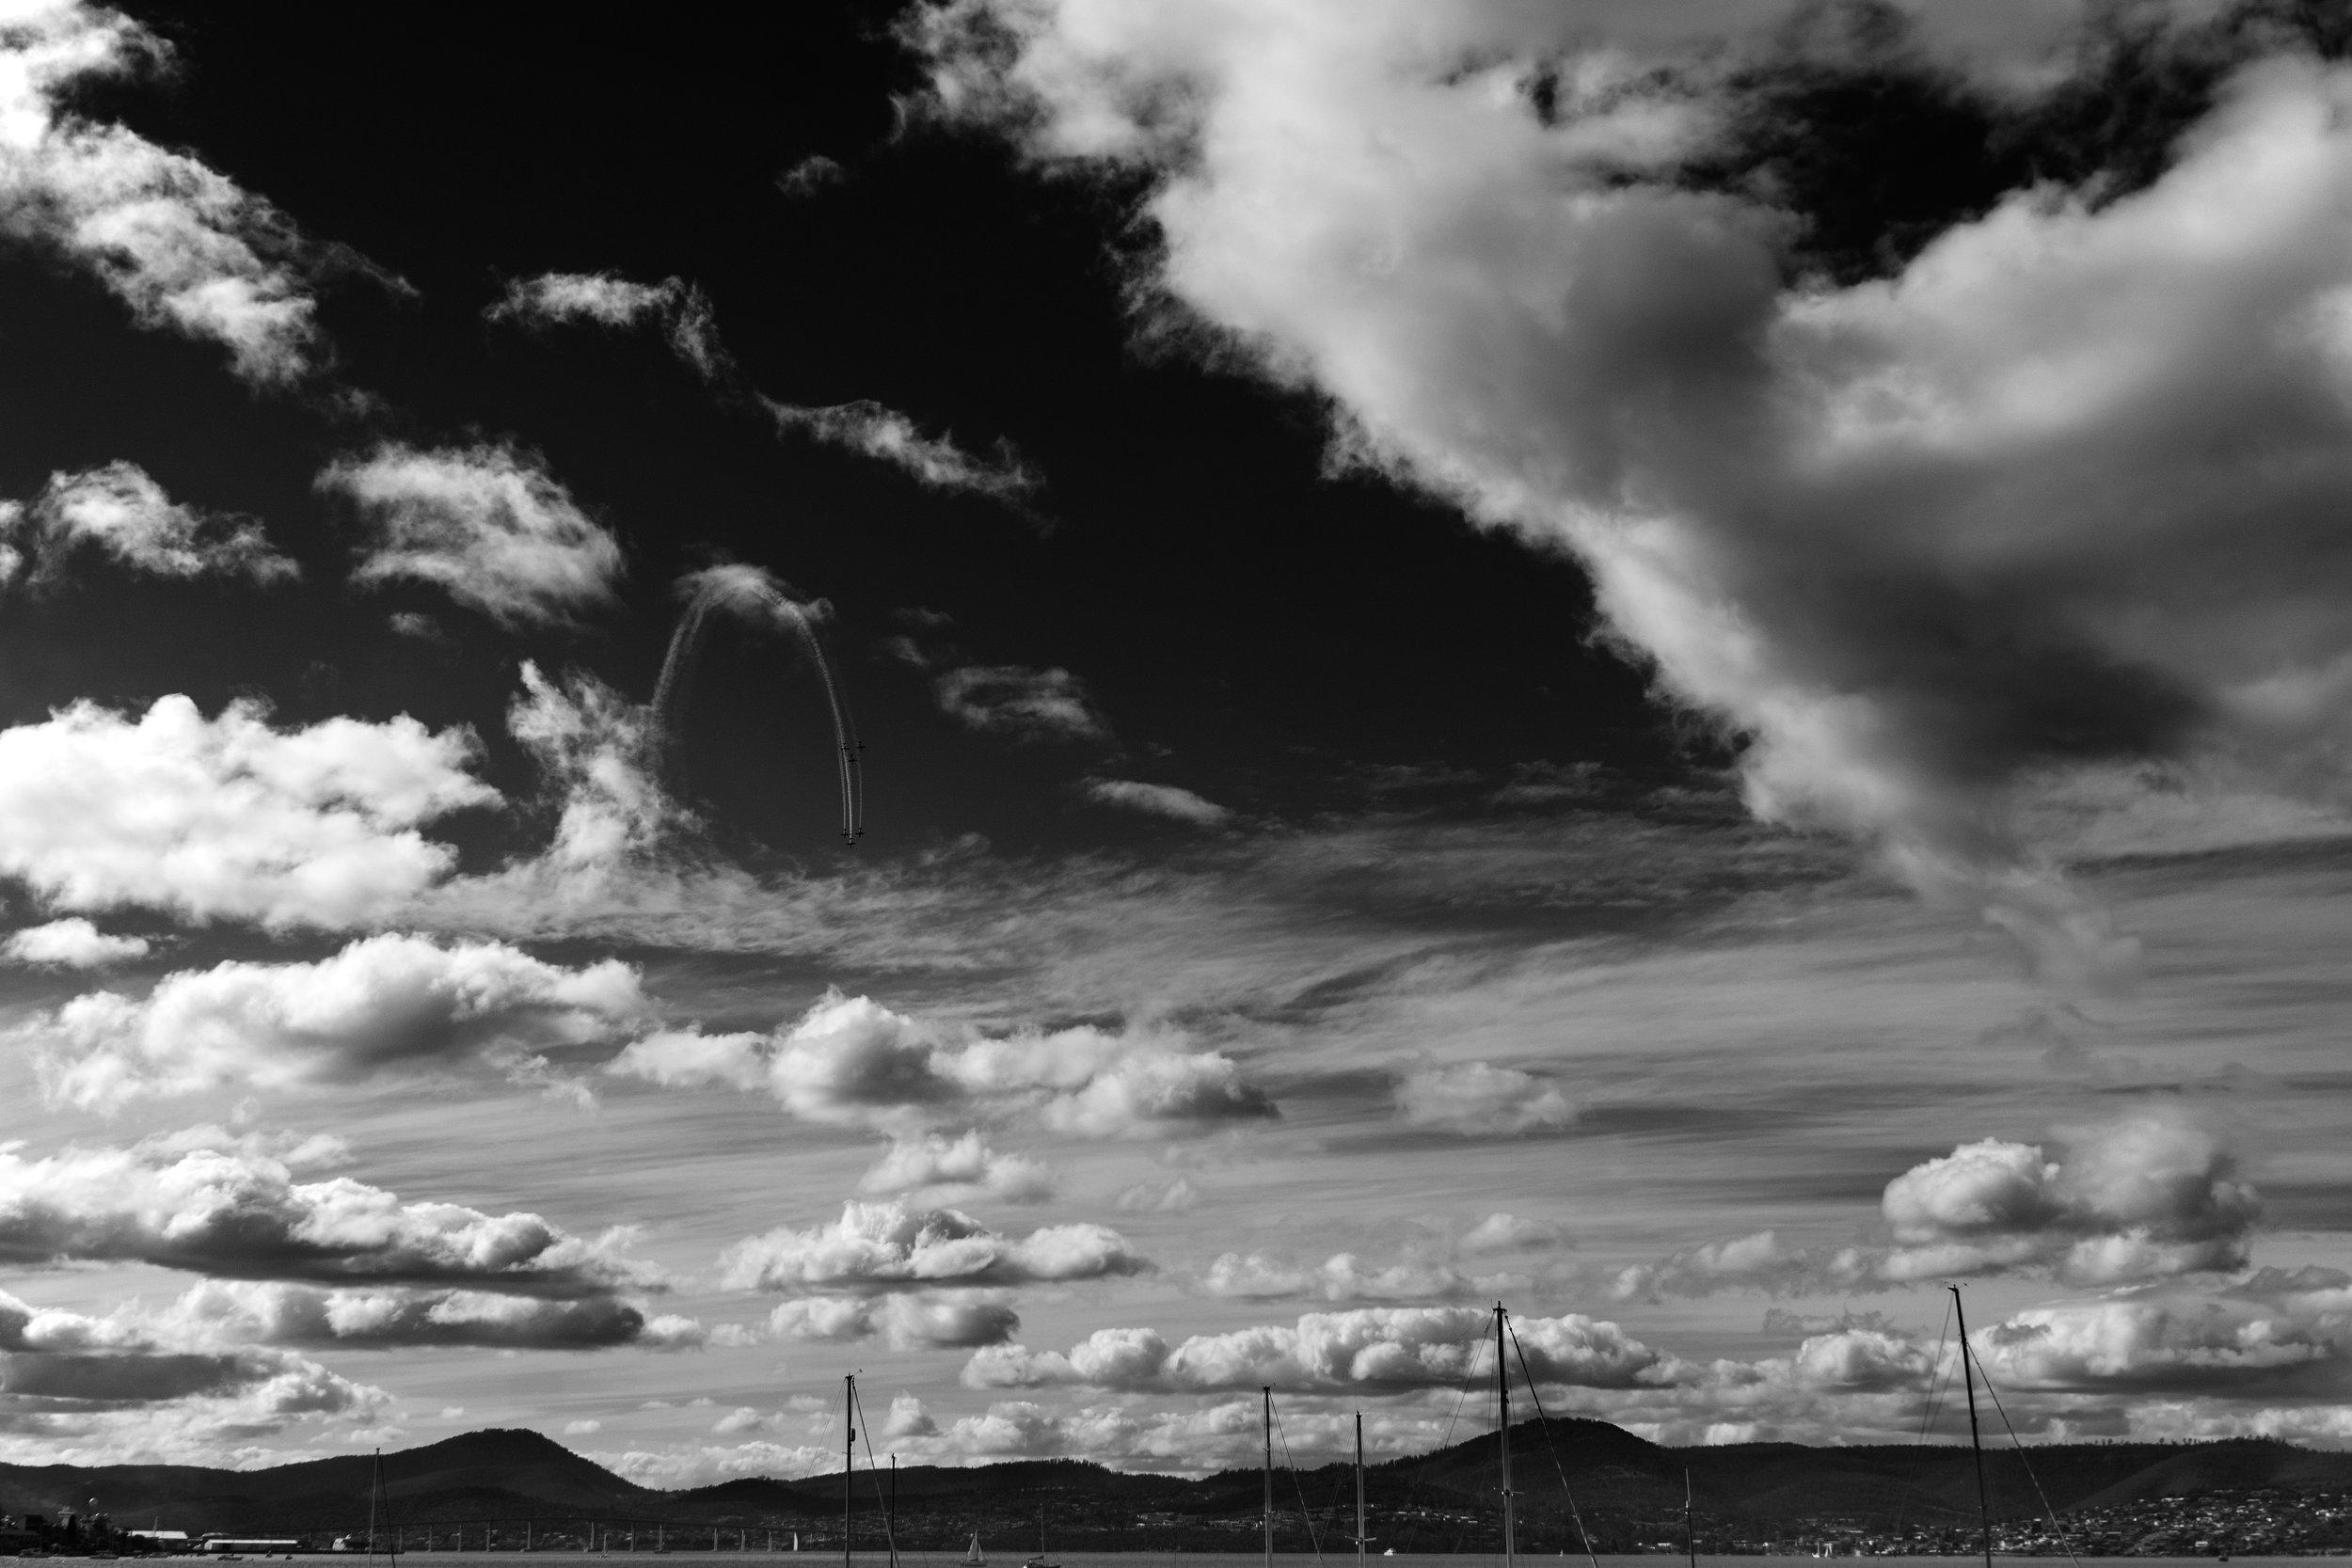 2013-09-13 - Hobart - Sandy Bay - Airforce Roulettes - untitled-7236-Edit.jpg